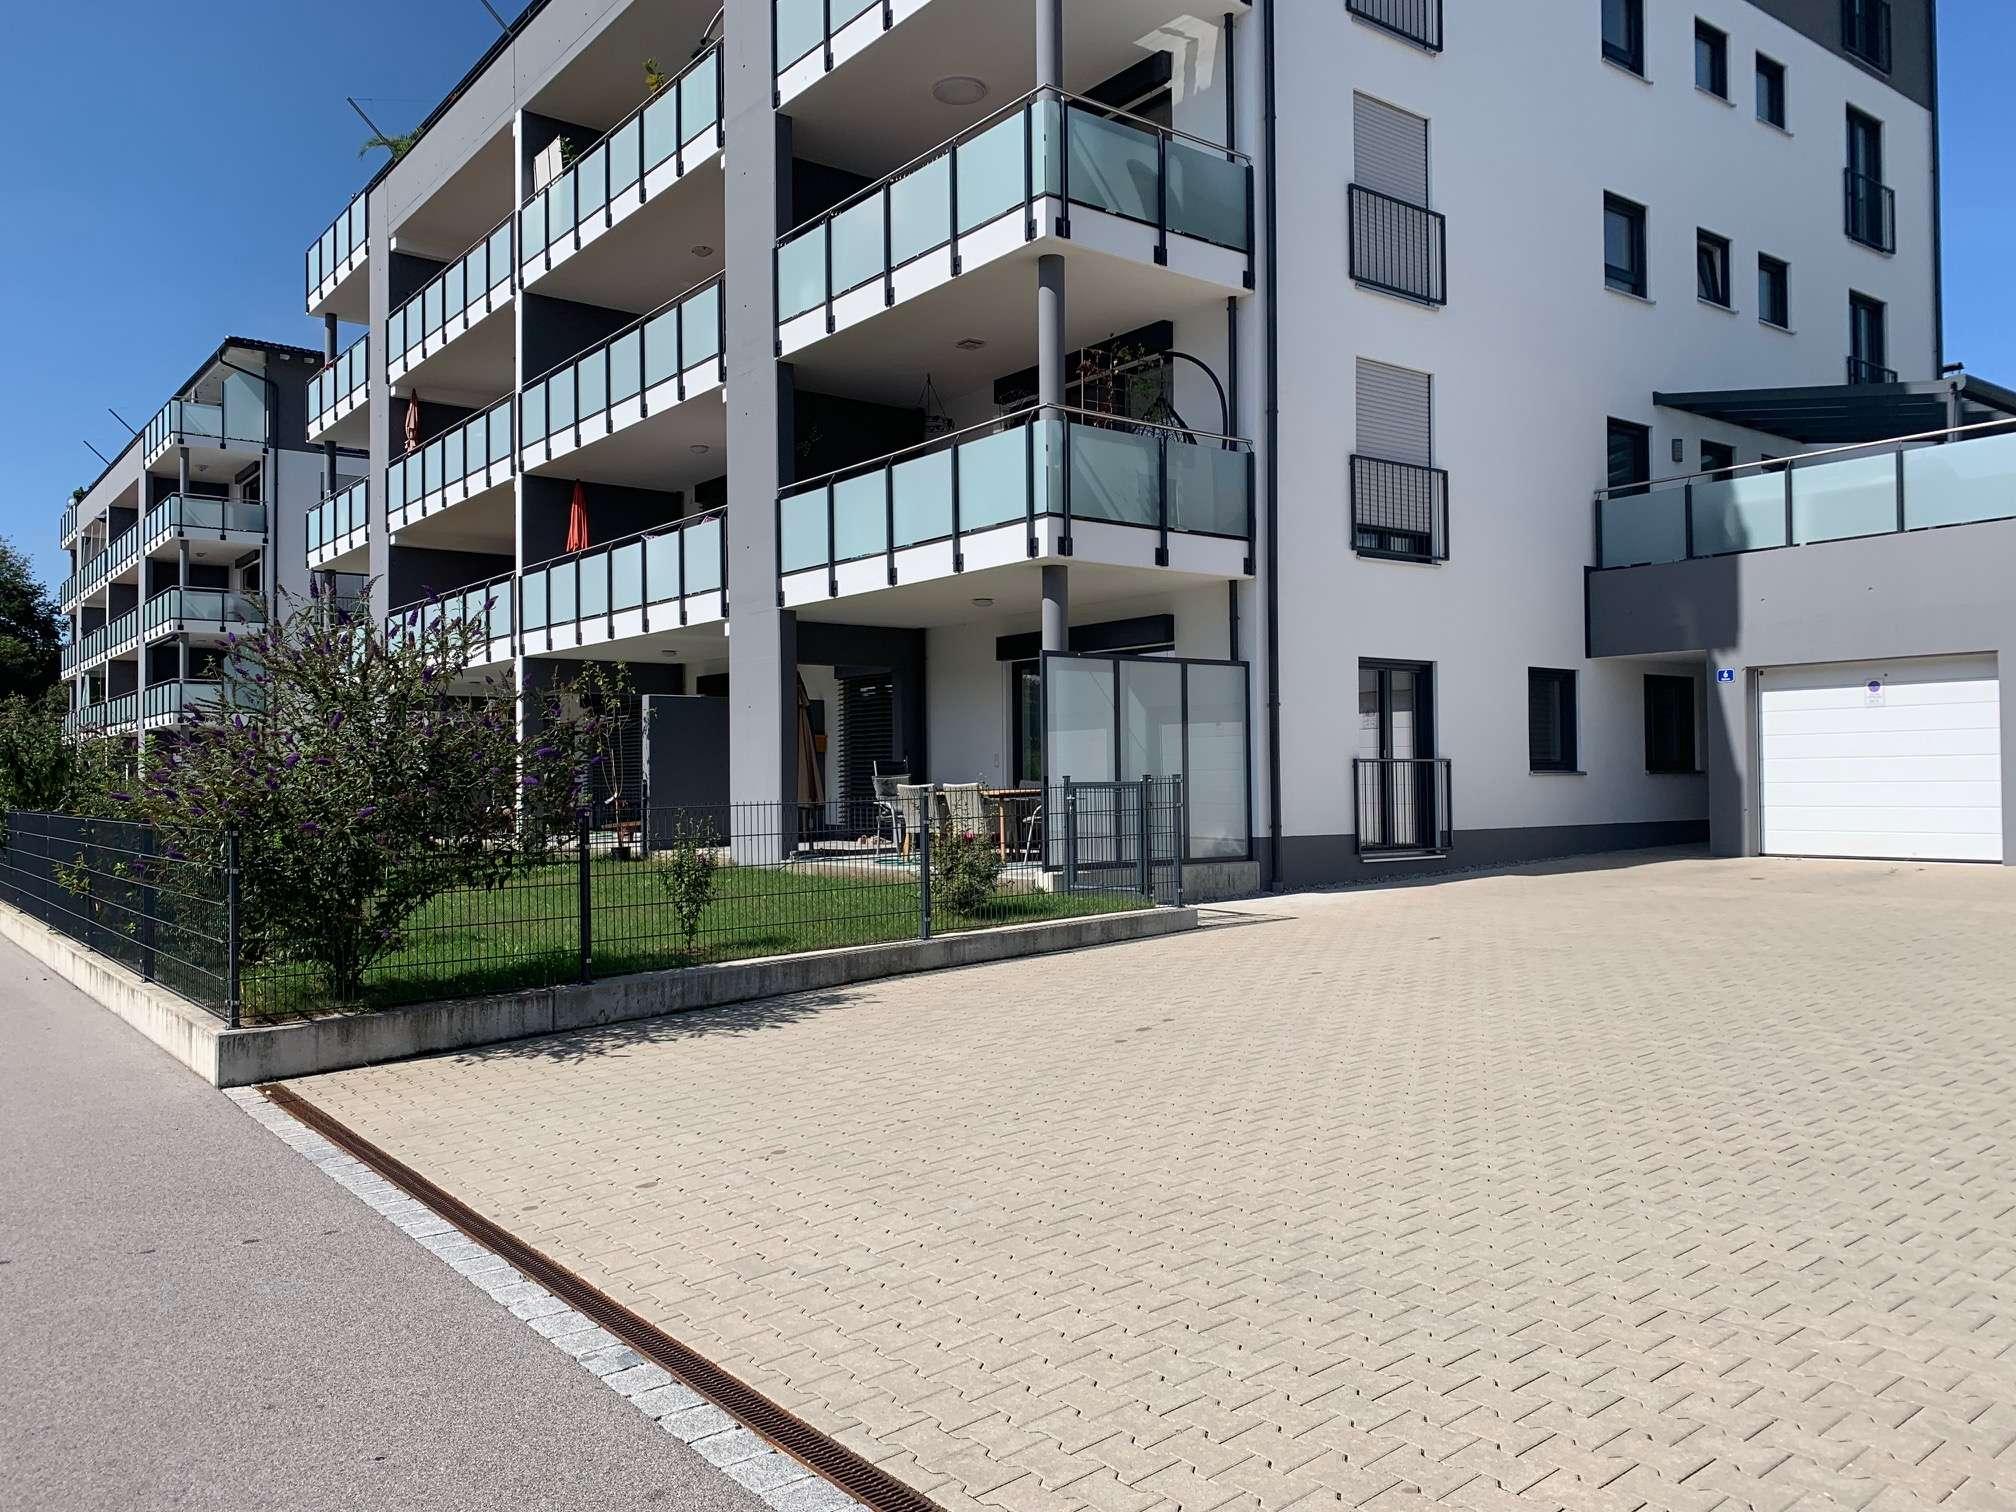 Neuwertige 2,5-Zimmer-Erdgeschosswohnung mit Terrasse und Garten in Simbach am Inn in Simbach am Inn